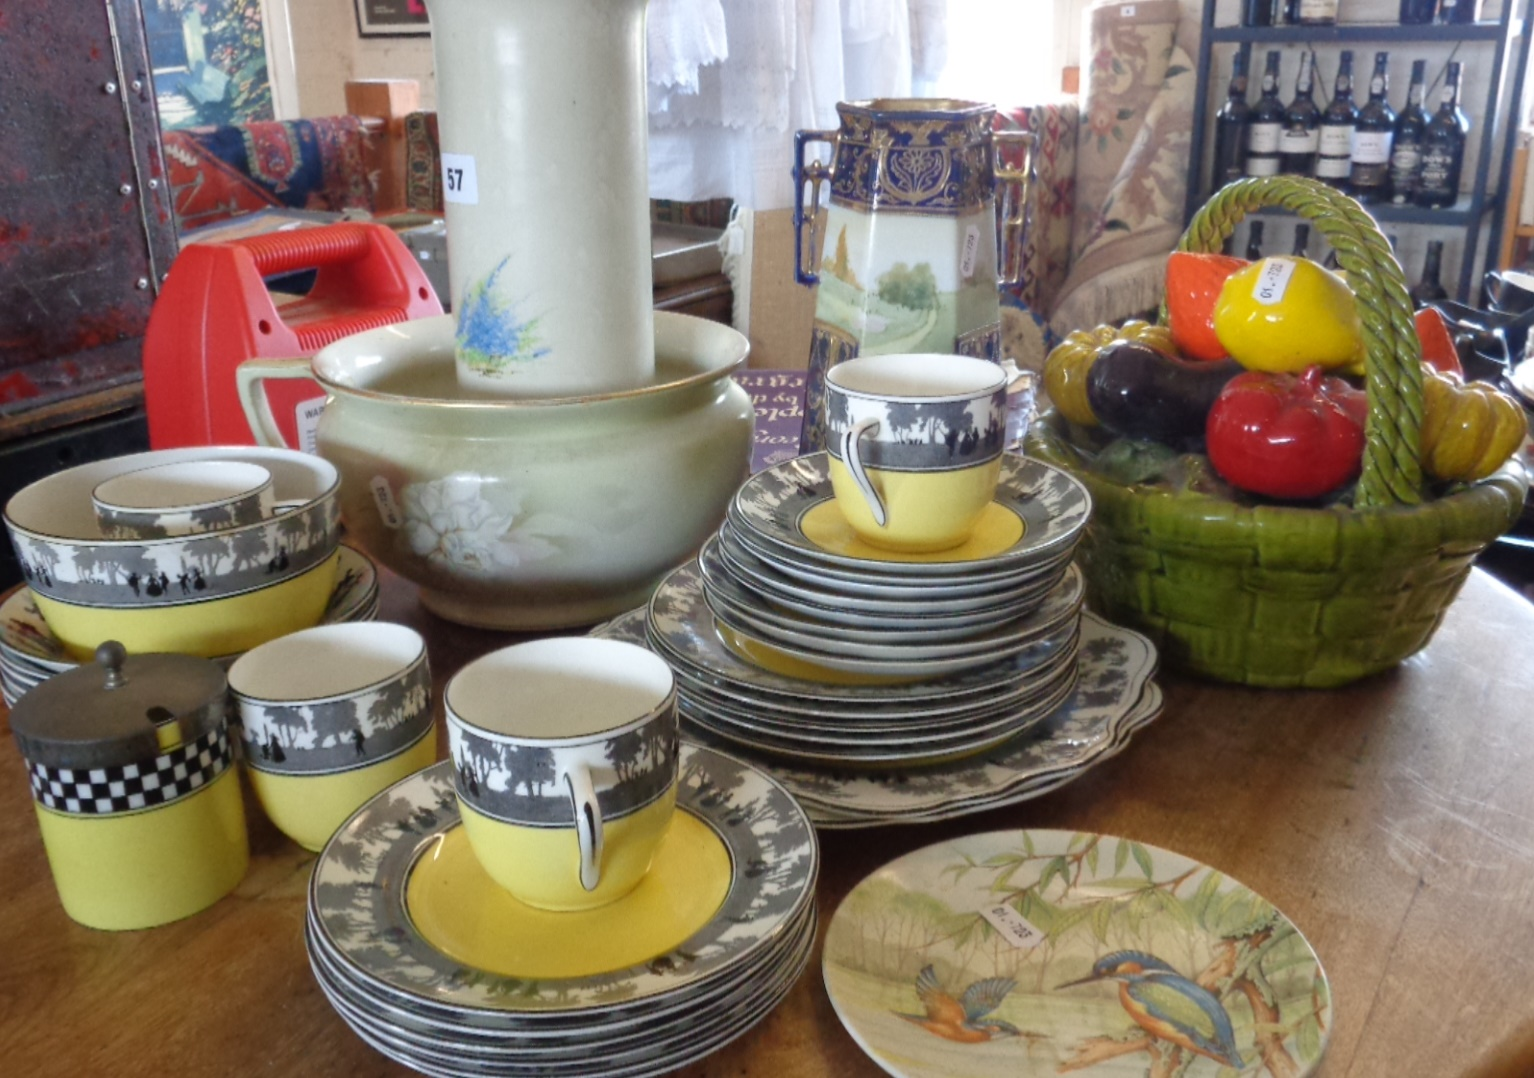 Lot 57 - Art Deco ceramics, Foley china Silhouette pattern tea ware, Hanley vase, etc